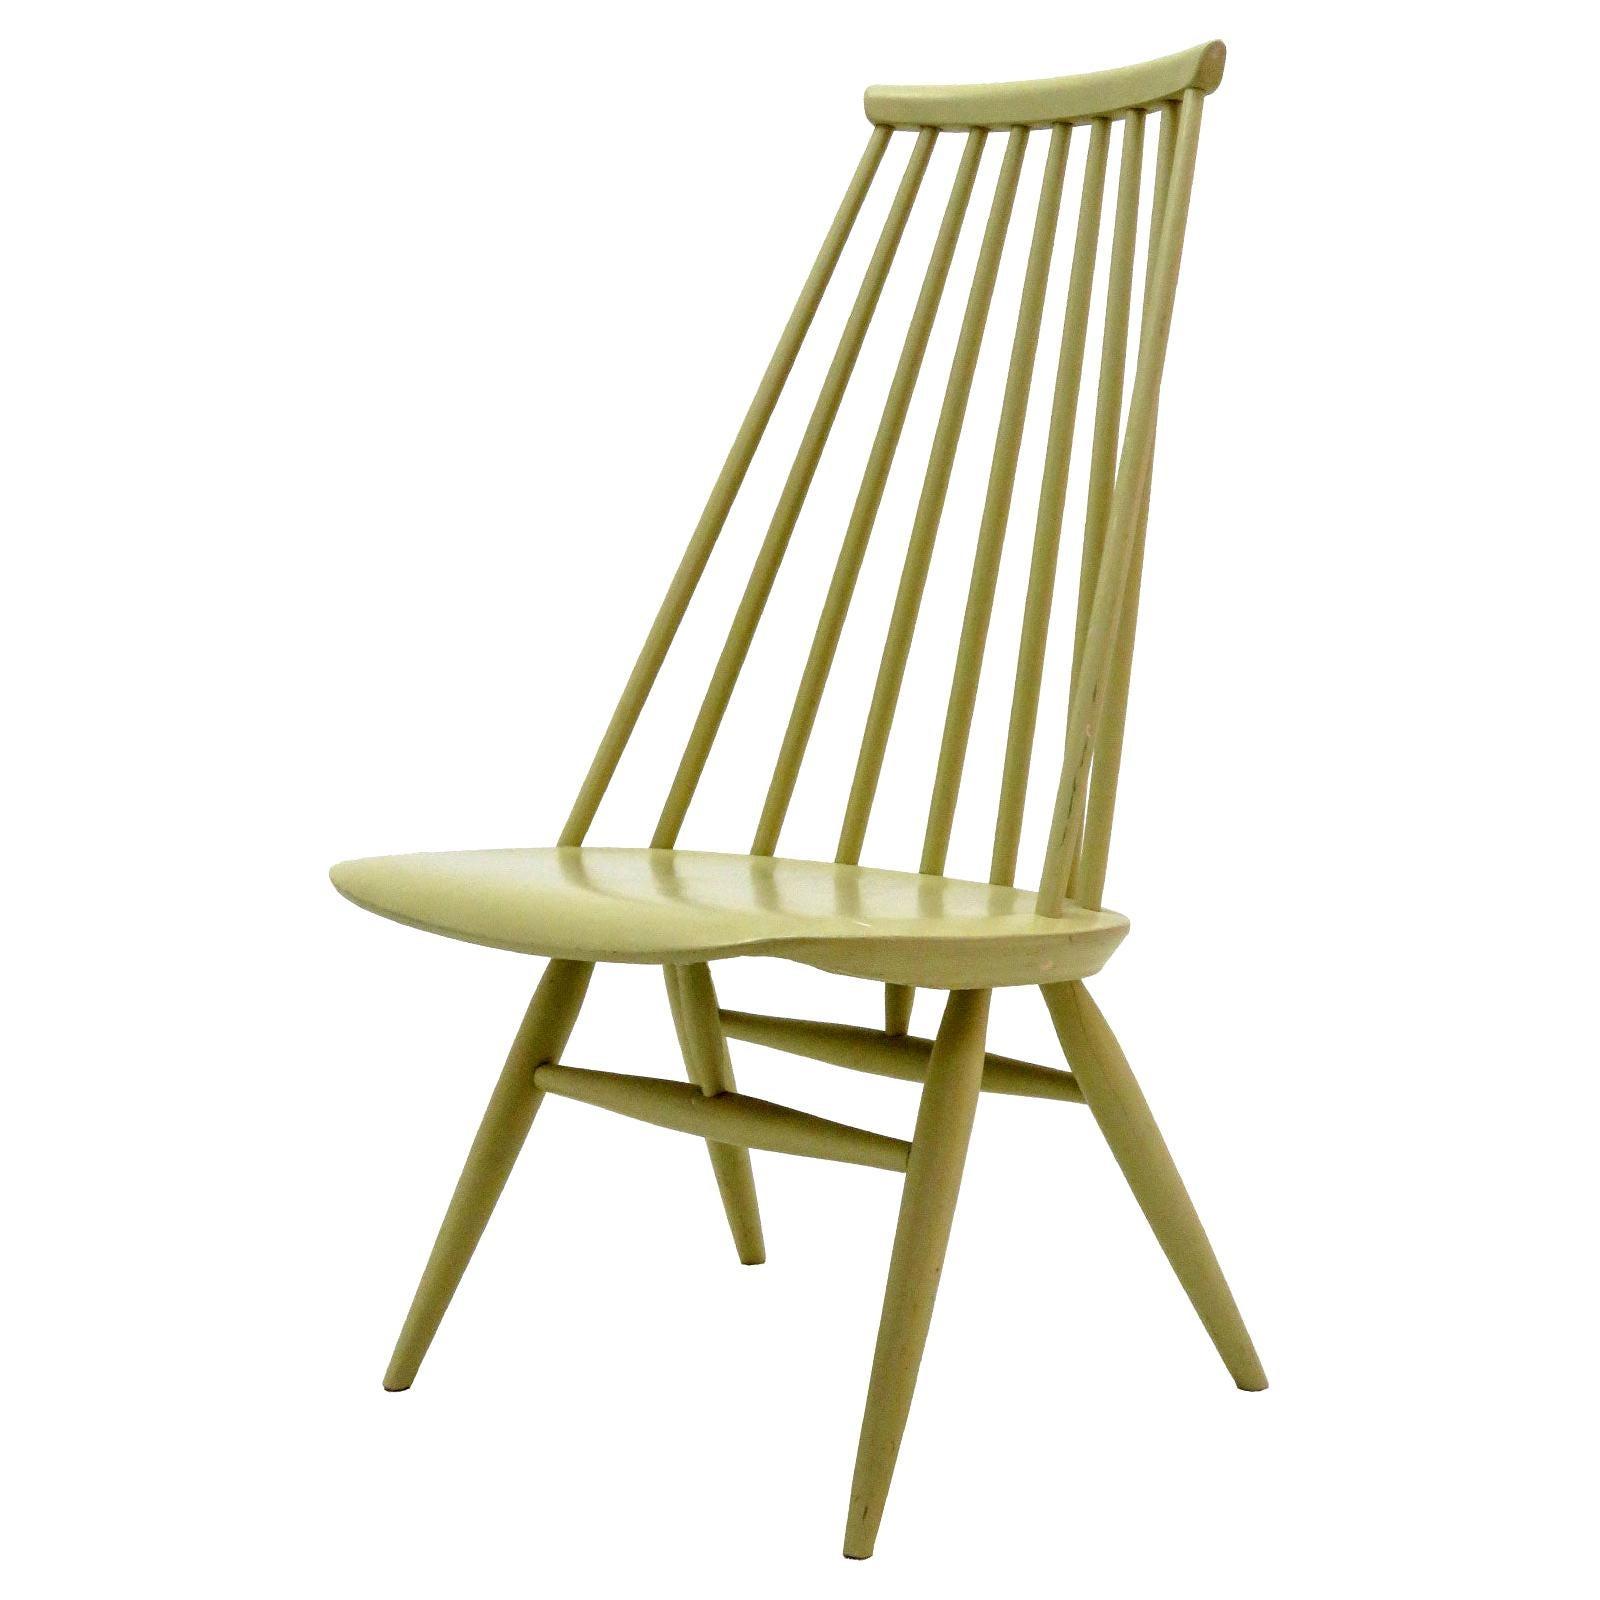 Ilmari Tapiovaara 'Mademoiselle' Chair, 1950